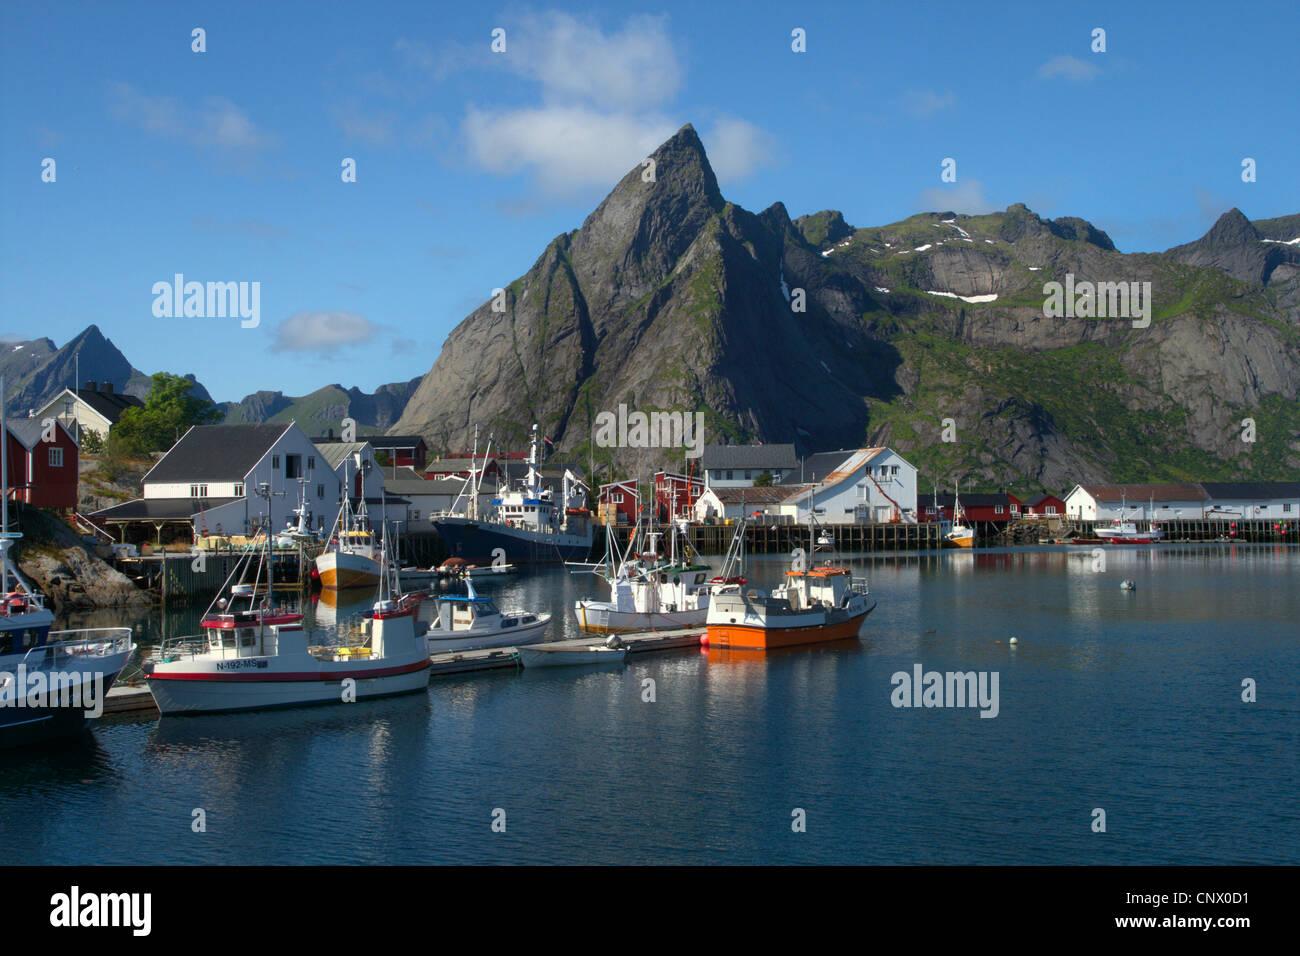 fishing village with mountain Olstinden, Norway, Lofoten Islands Stock Photo